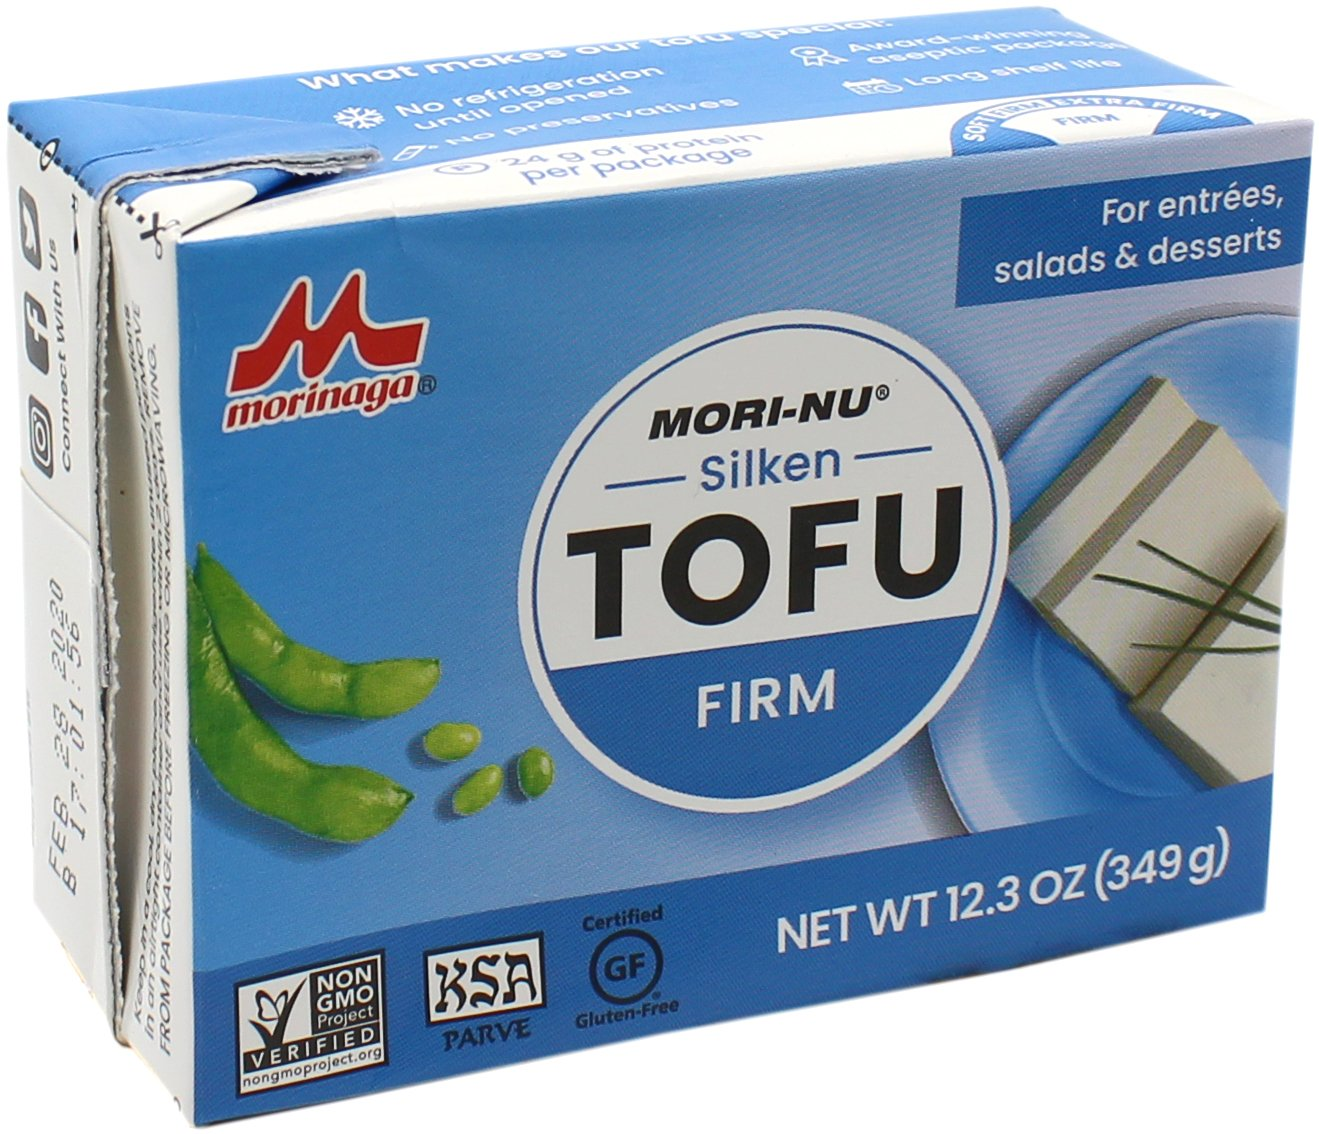 Tofu Firm 349GR